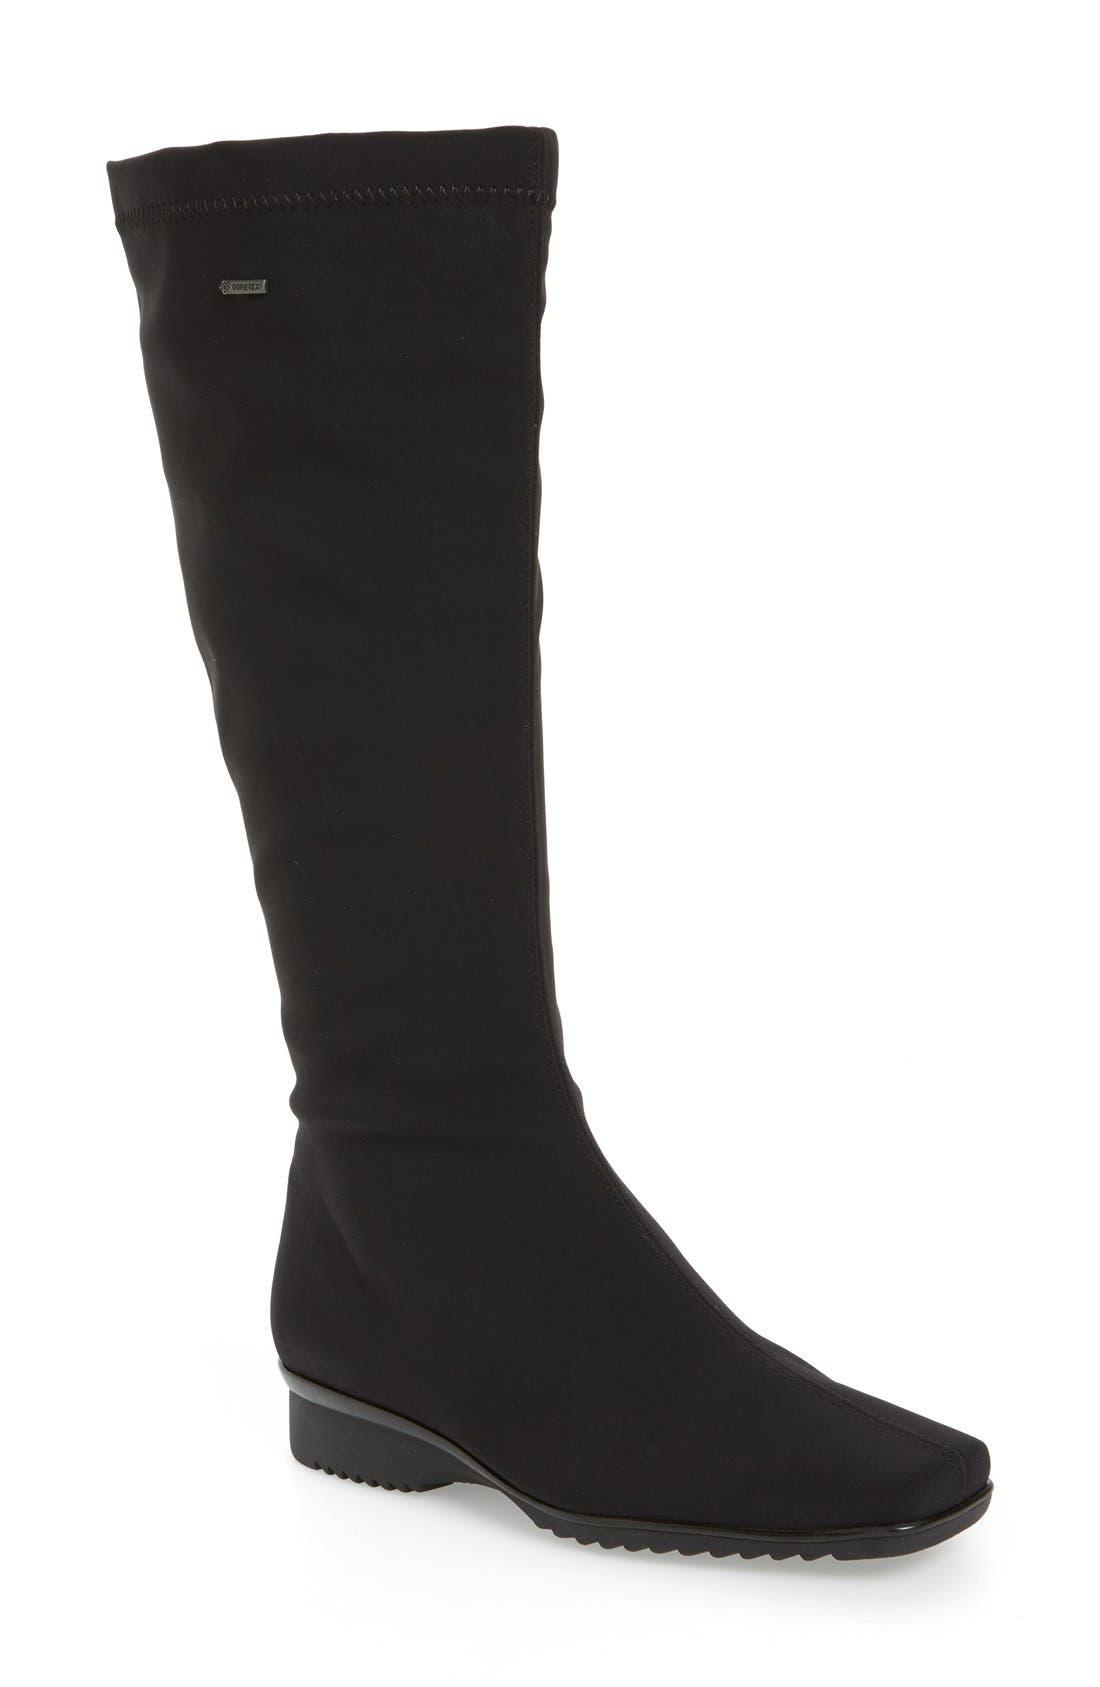 ARA 'Paula' Weatherproof Gore-Tex® Boot